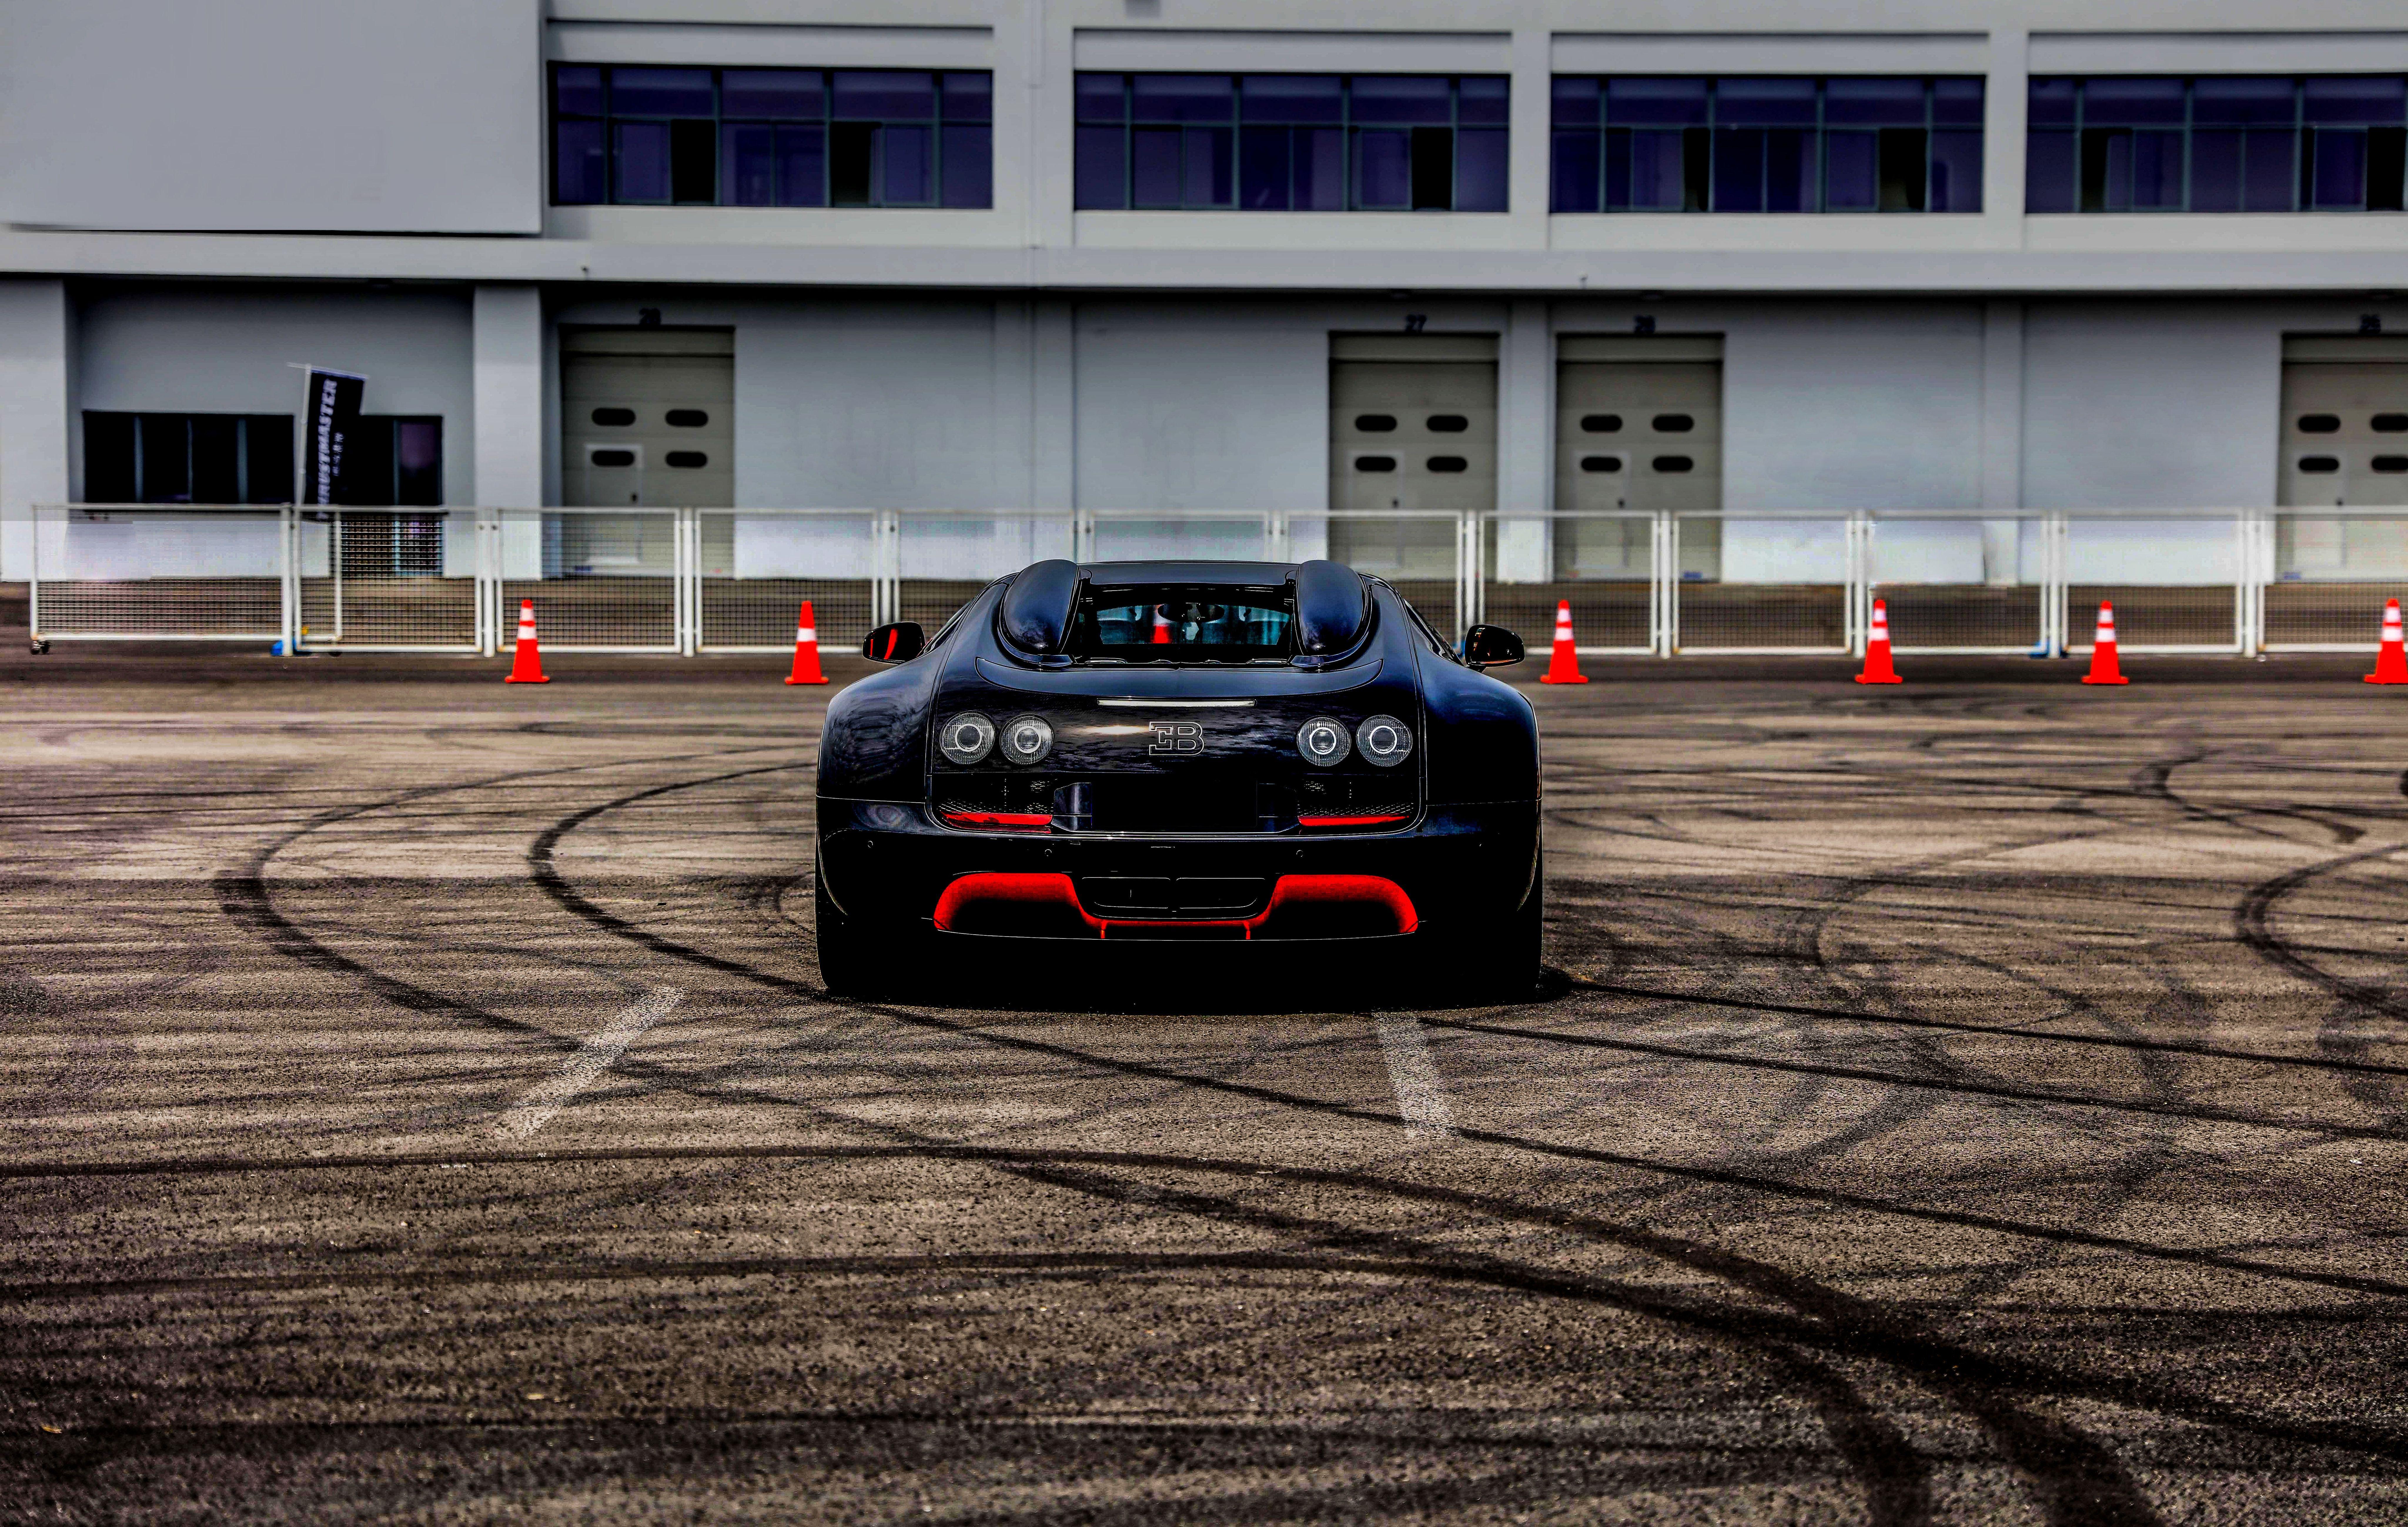 74158 скачать обои Бугатти (Bugatti), Bugatti Veyron, Тачки (Cars), Спорткар, Вид Сзади - заставки и картинки бесплатно